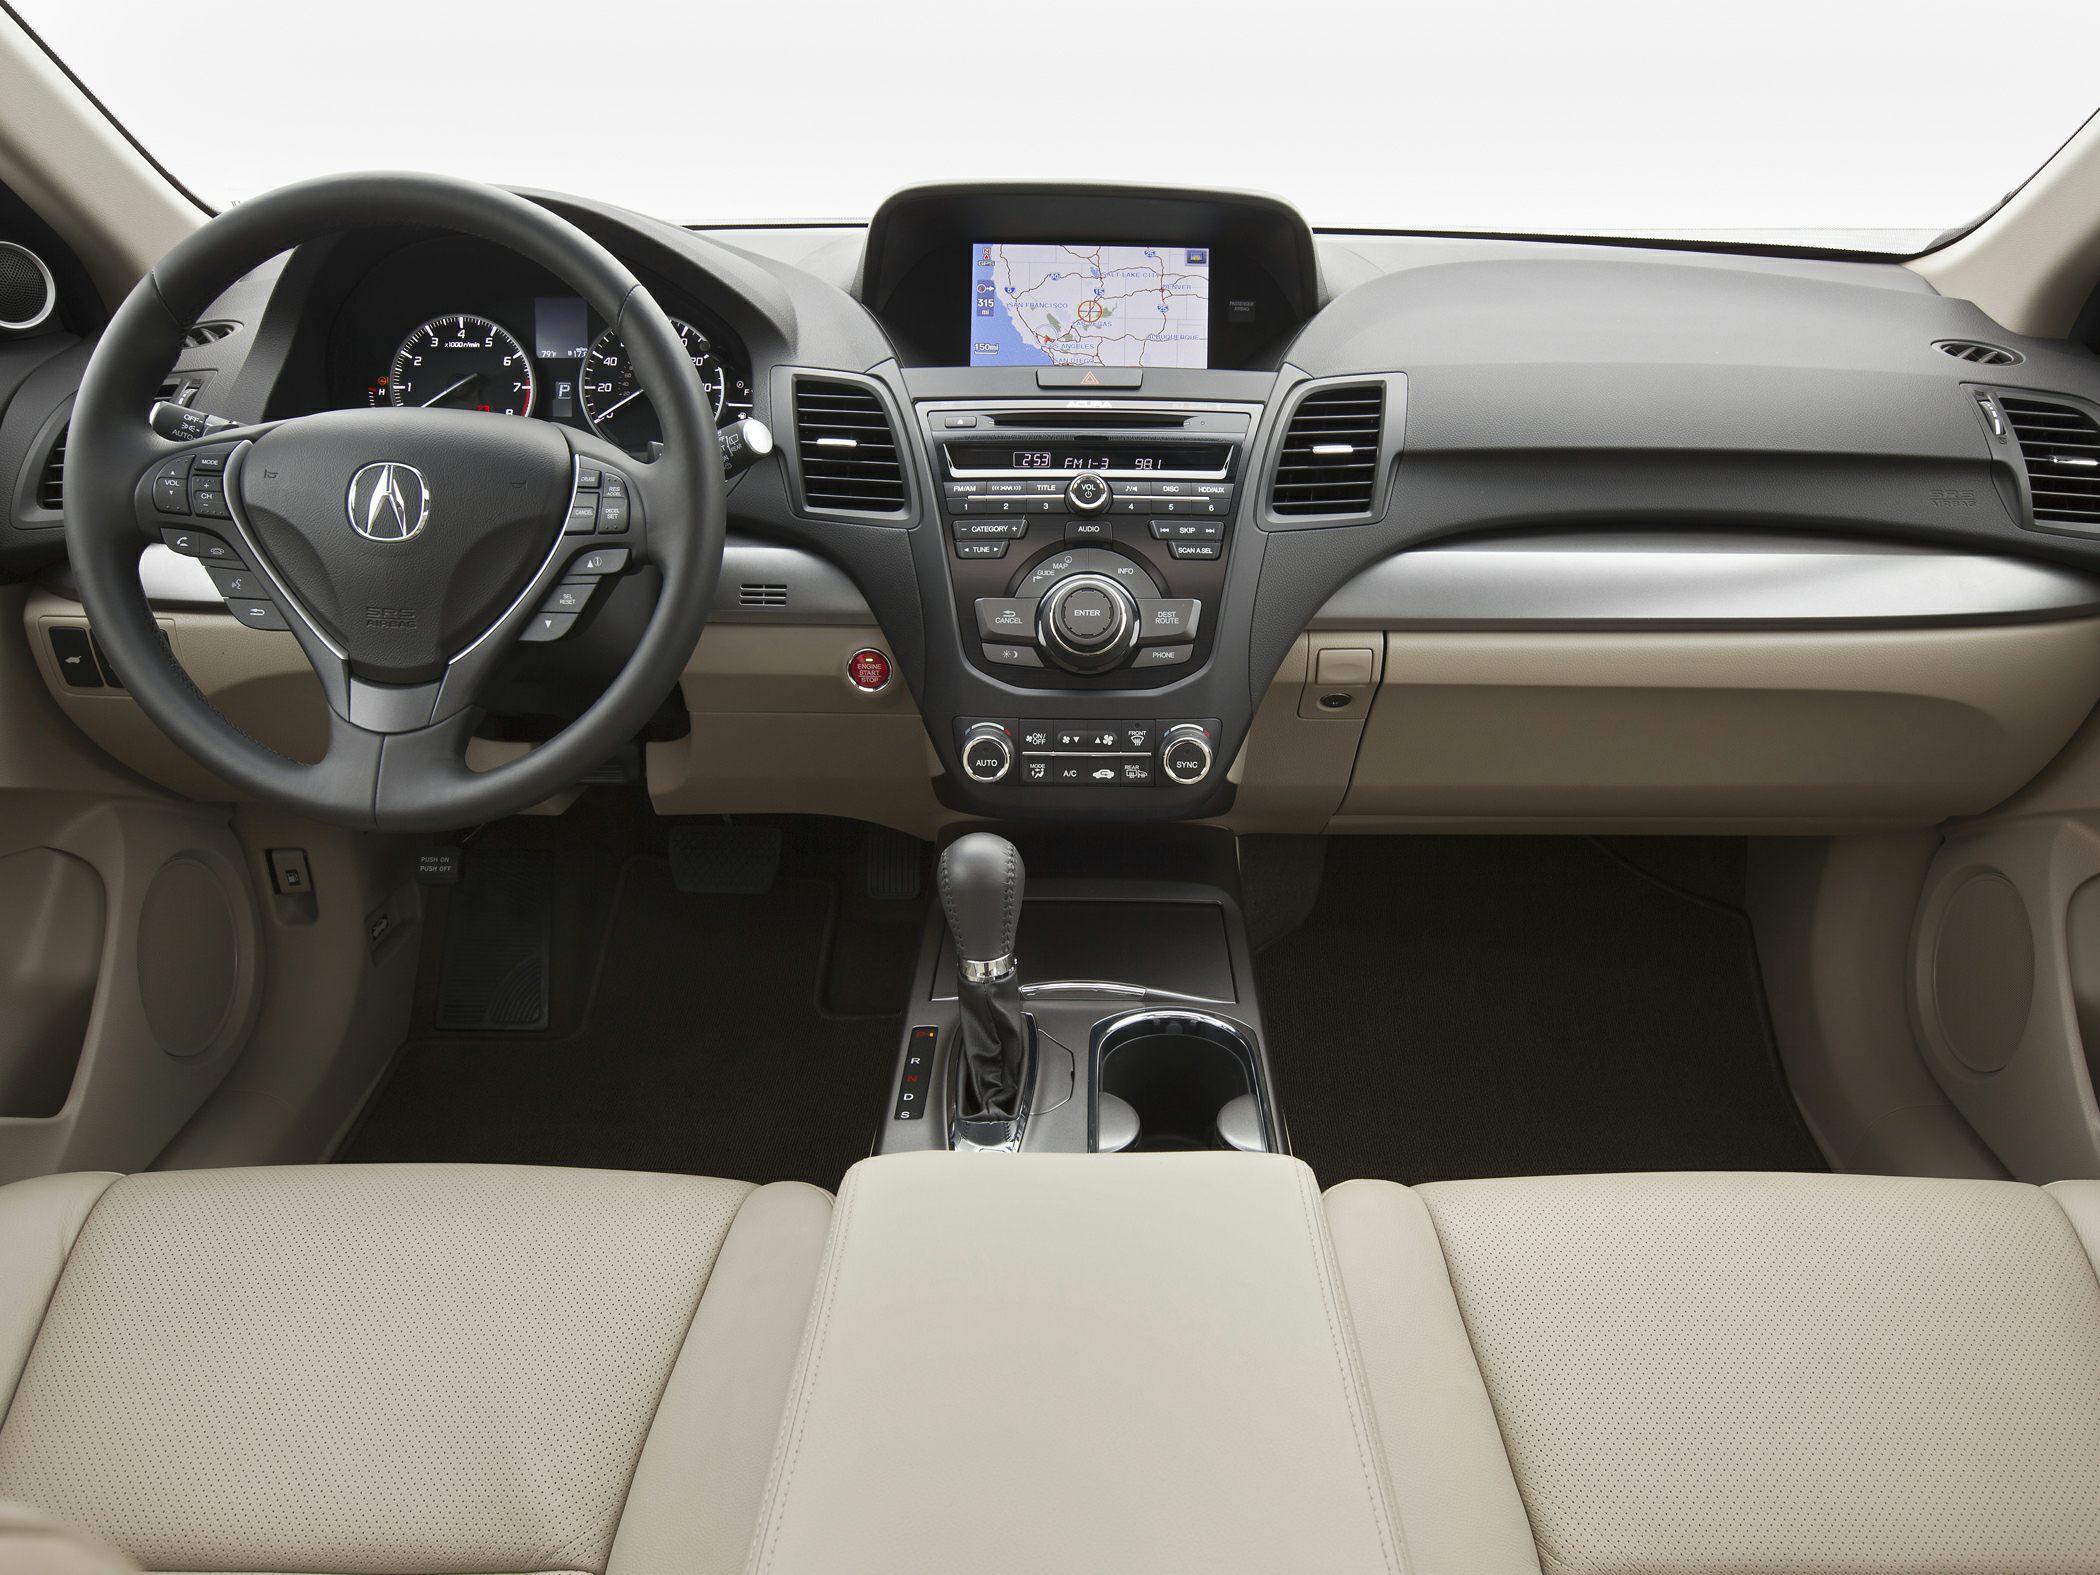 2014 Acura RDX Interior